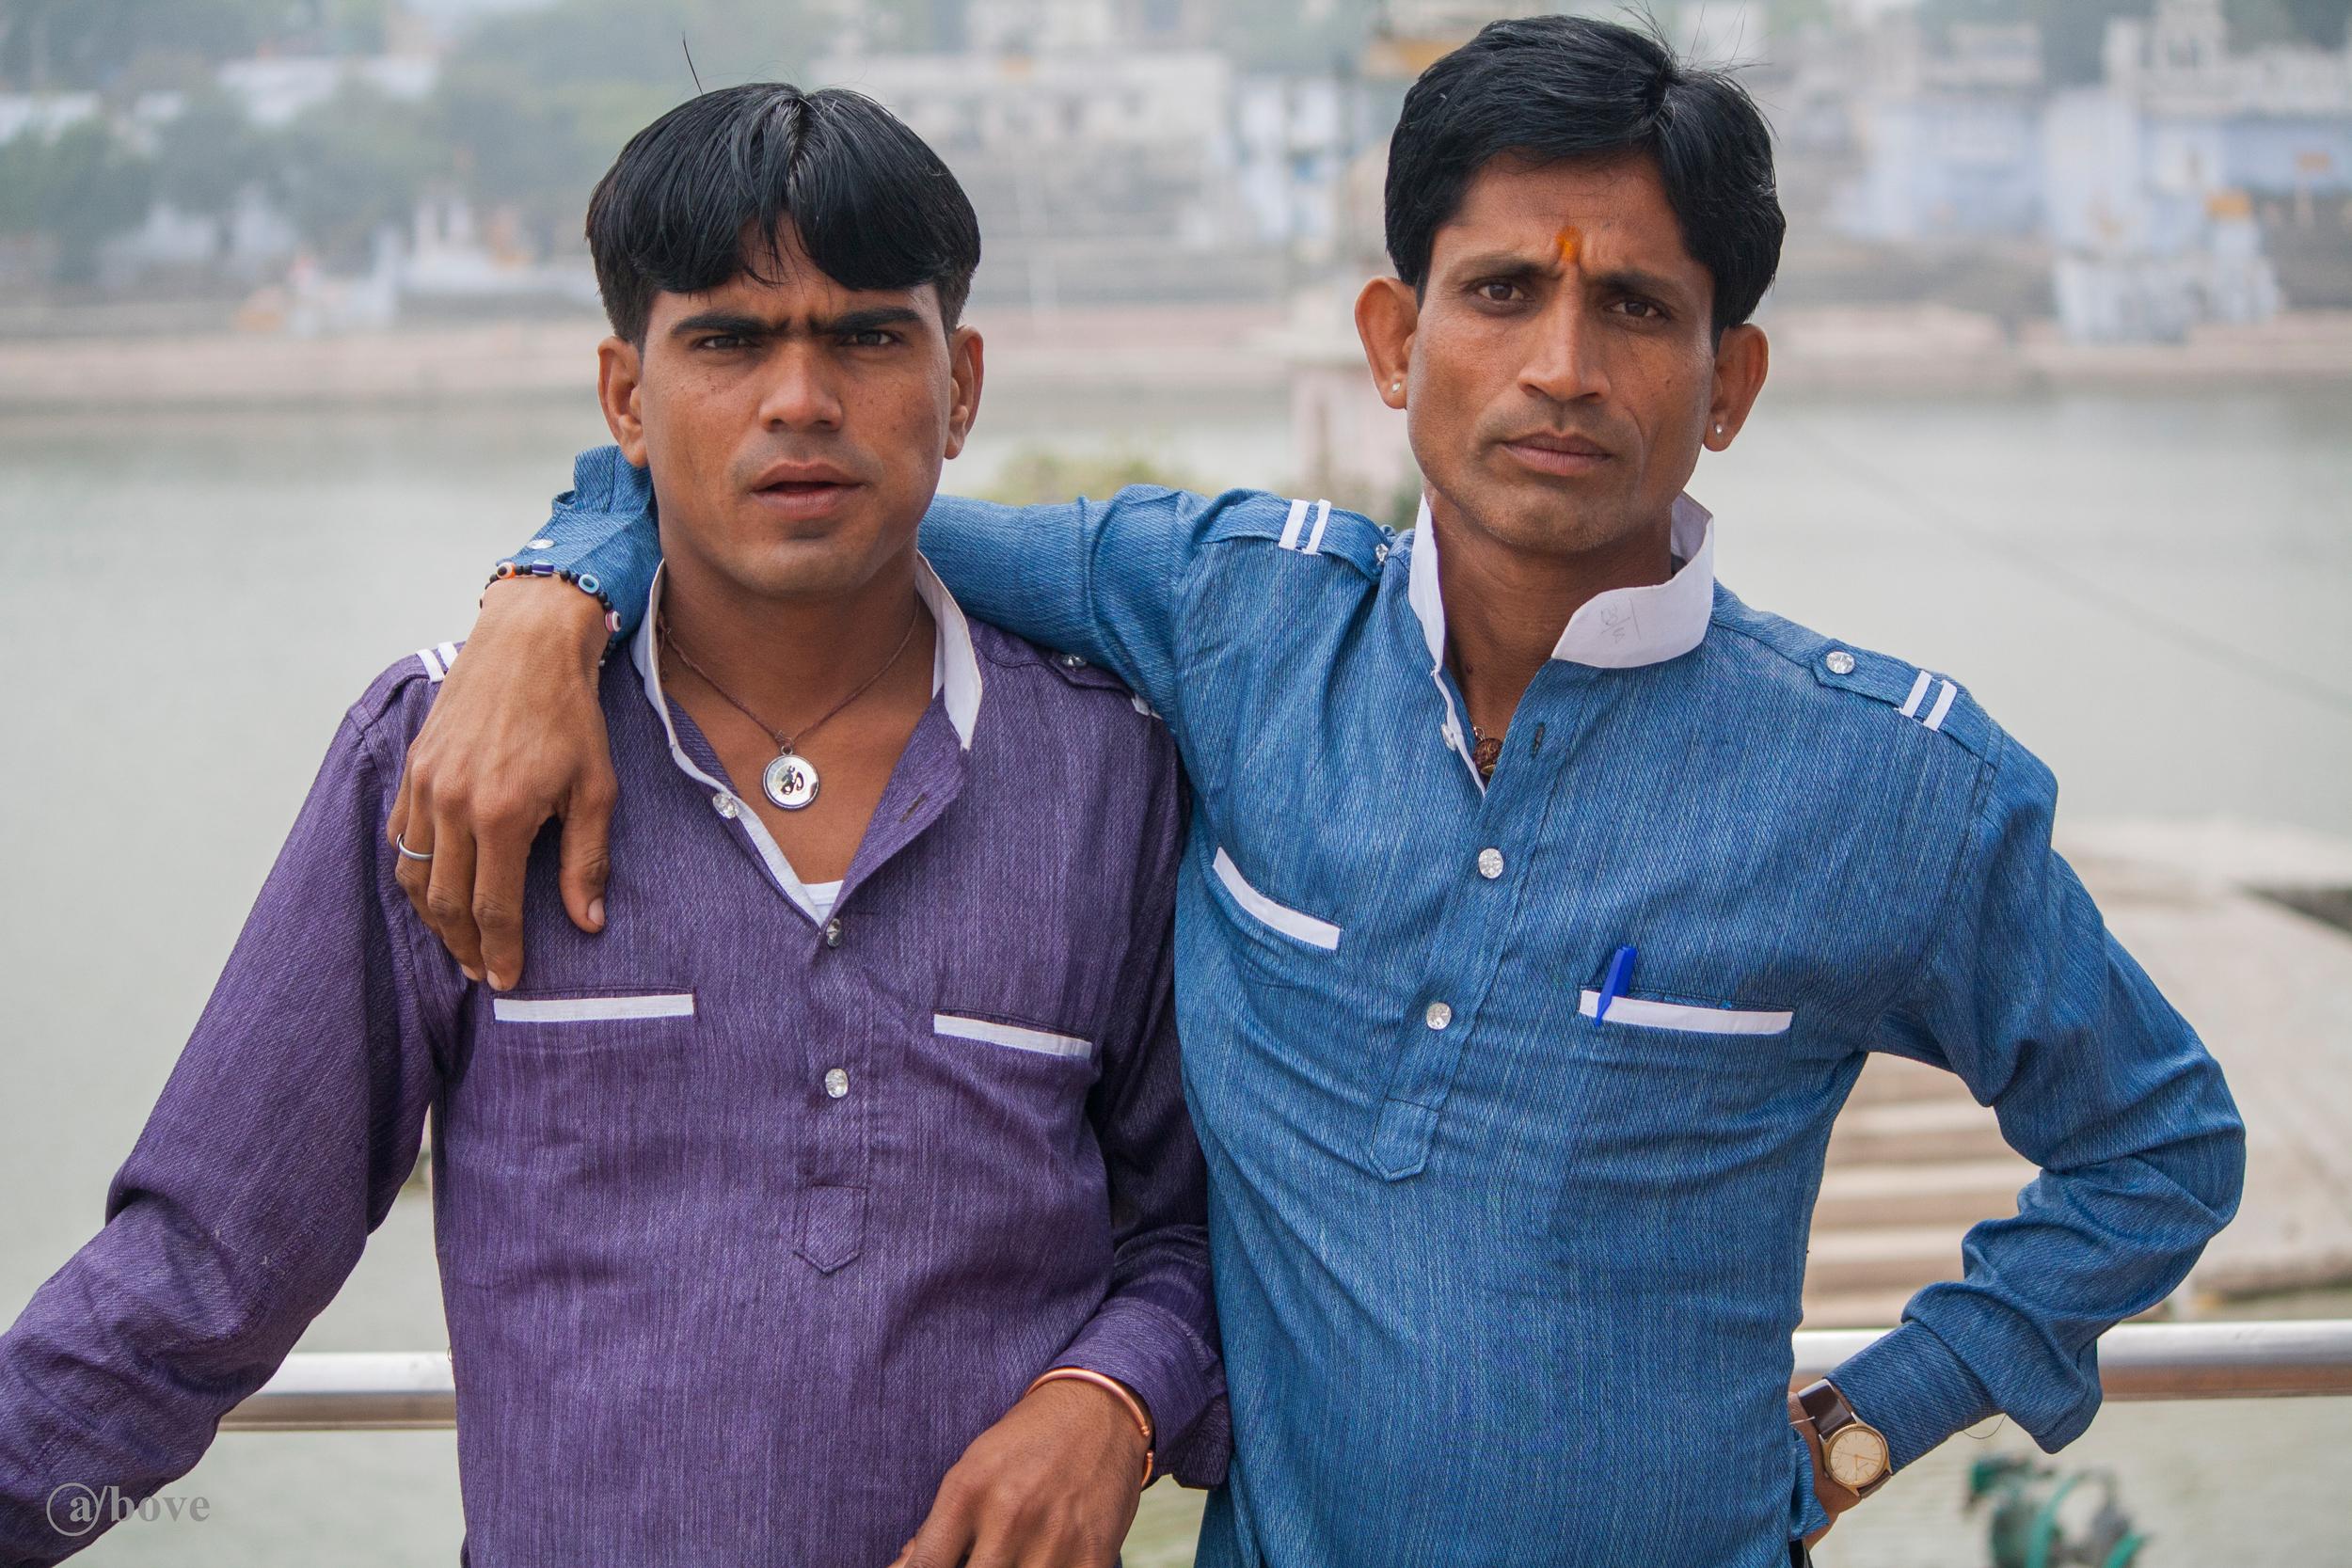 Portraits of India_39.jpg